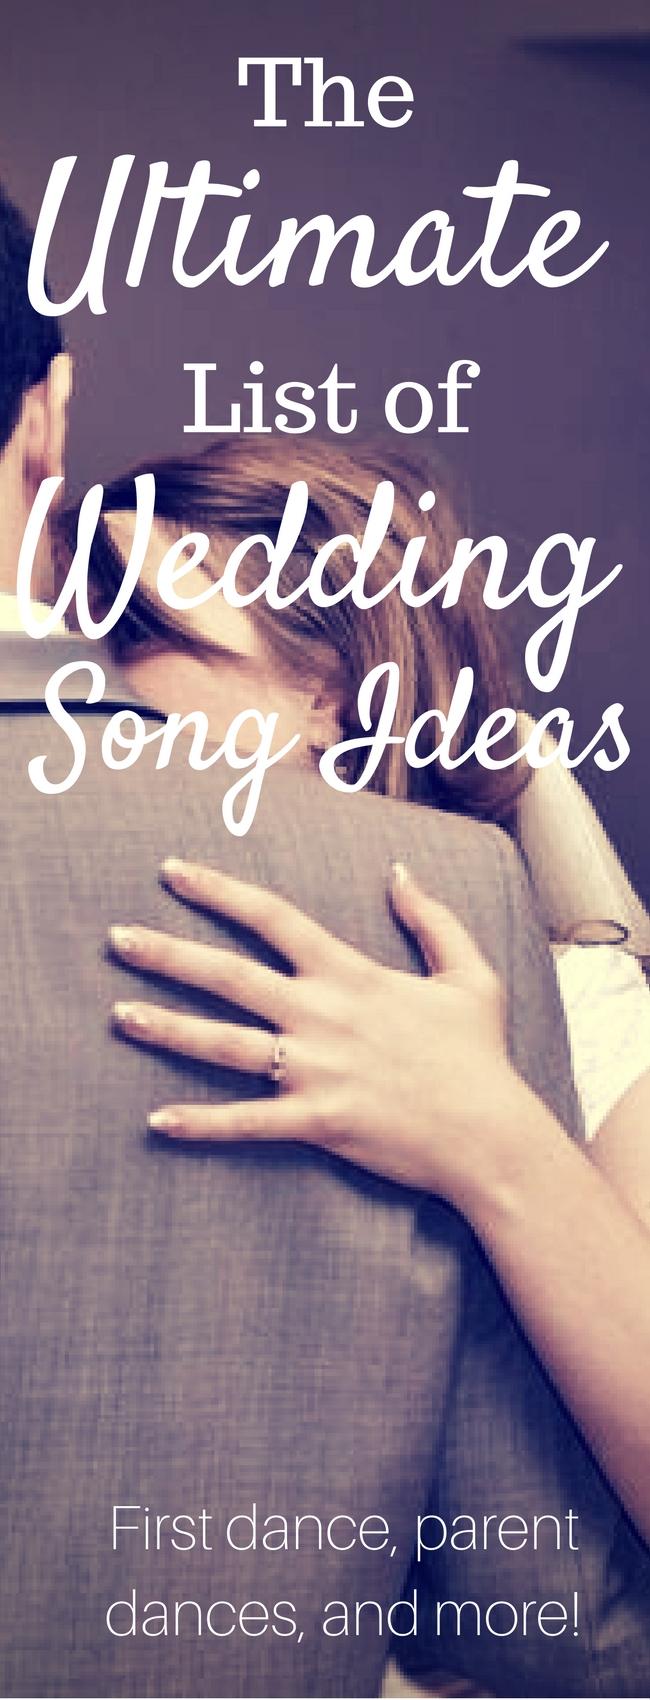 Wedding Song Ideas / Wedding Playlist / First Dance Ideas / First Dance Songs / Mother Son Dance / Father Daughter Dance / Love Songs